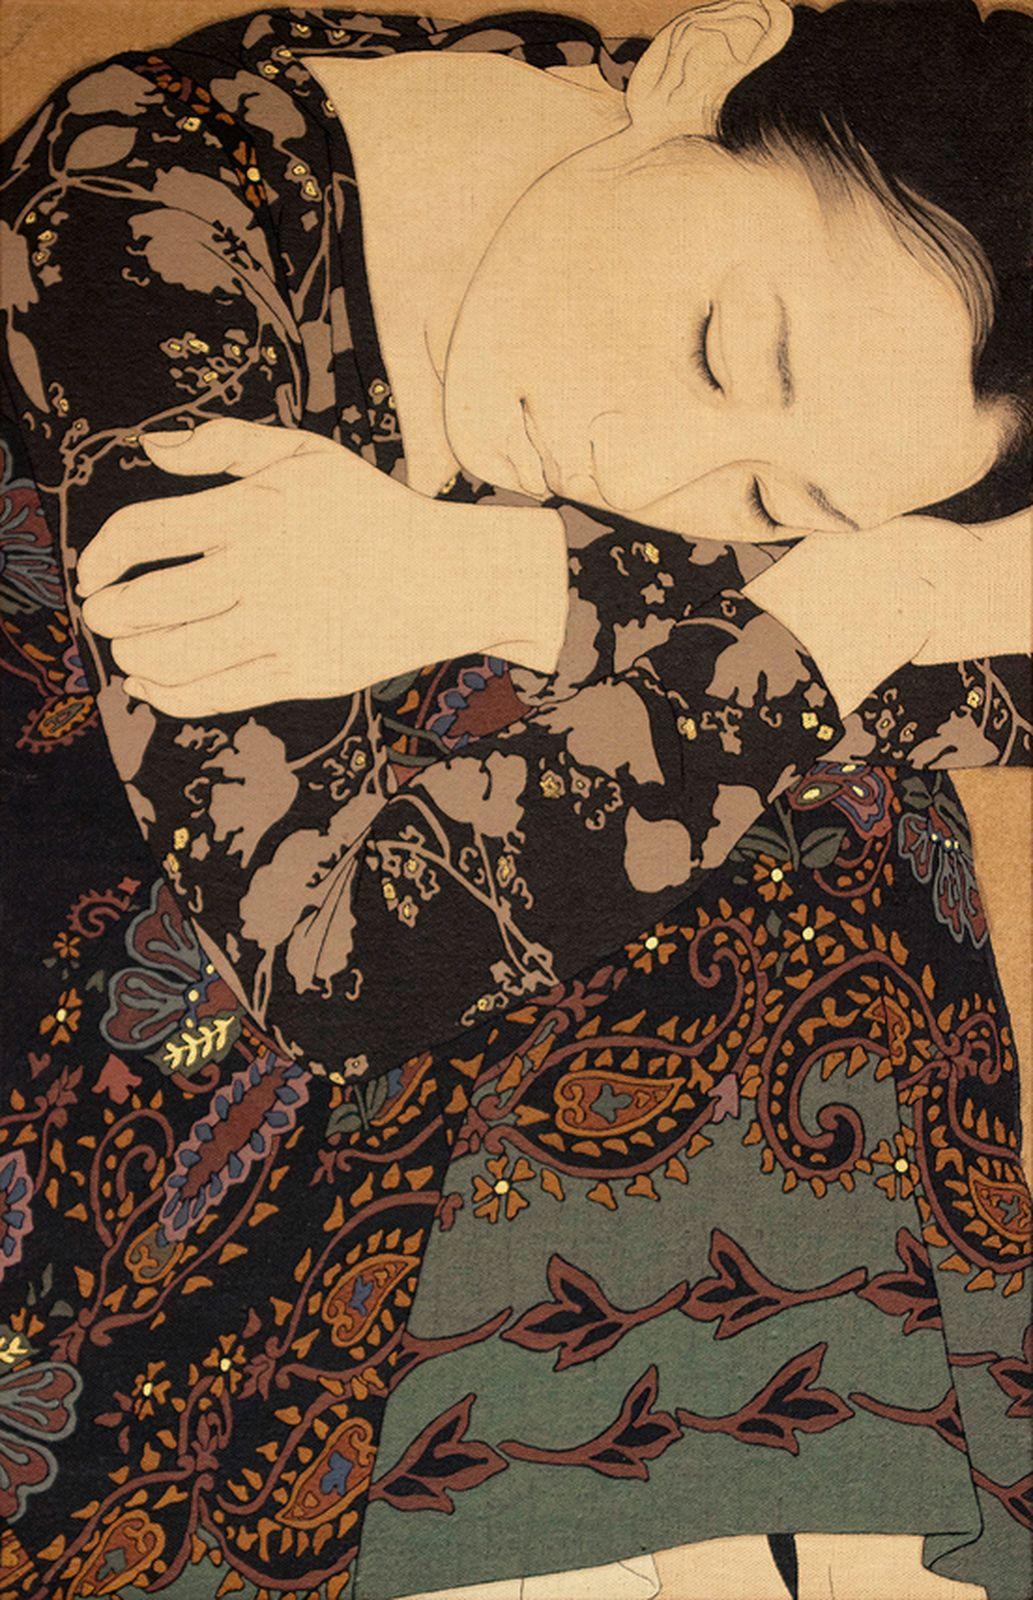 Ikenaga-Yasunari-_-paintings-_-artodyssey-_-Japan-2